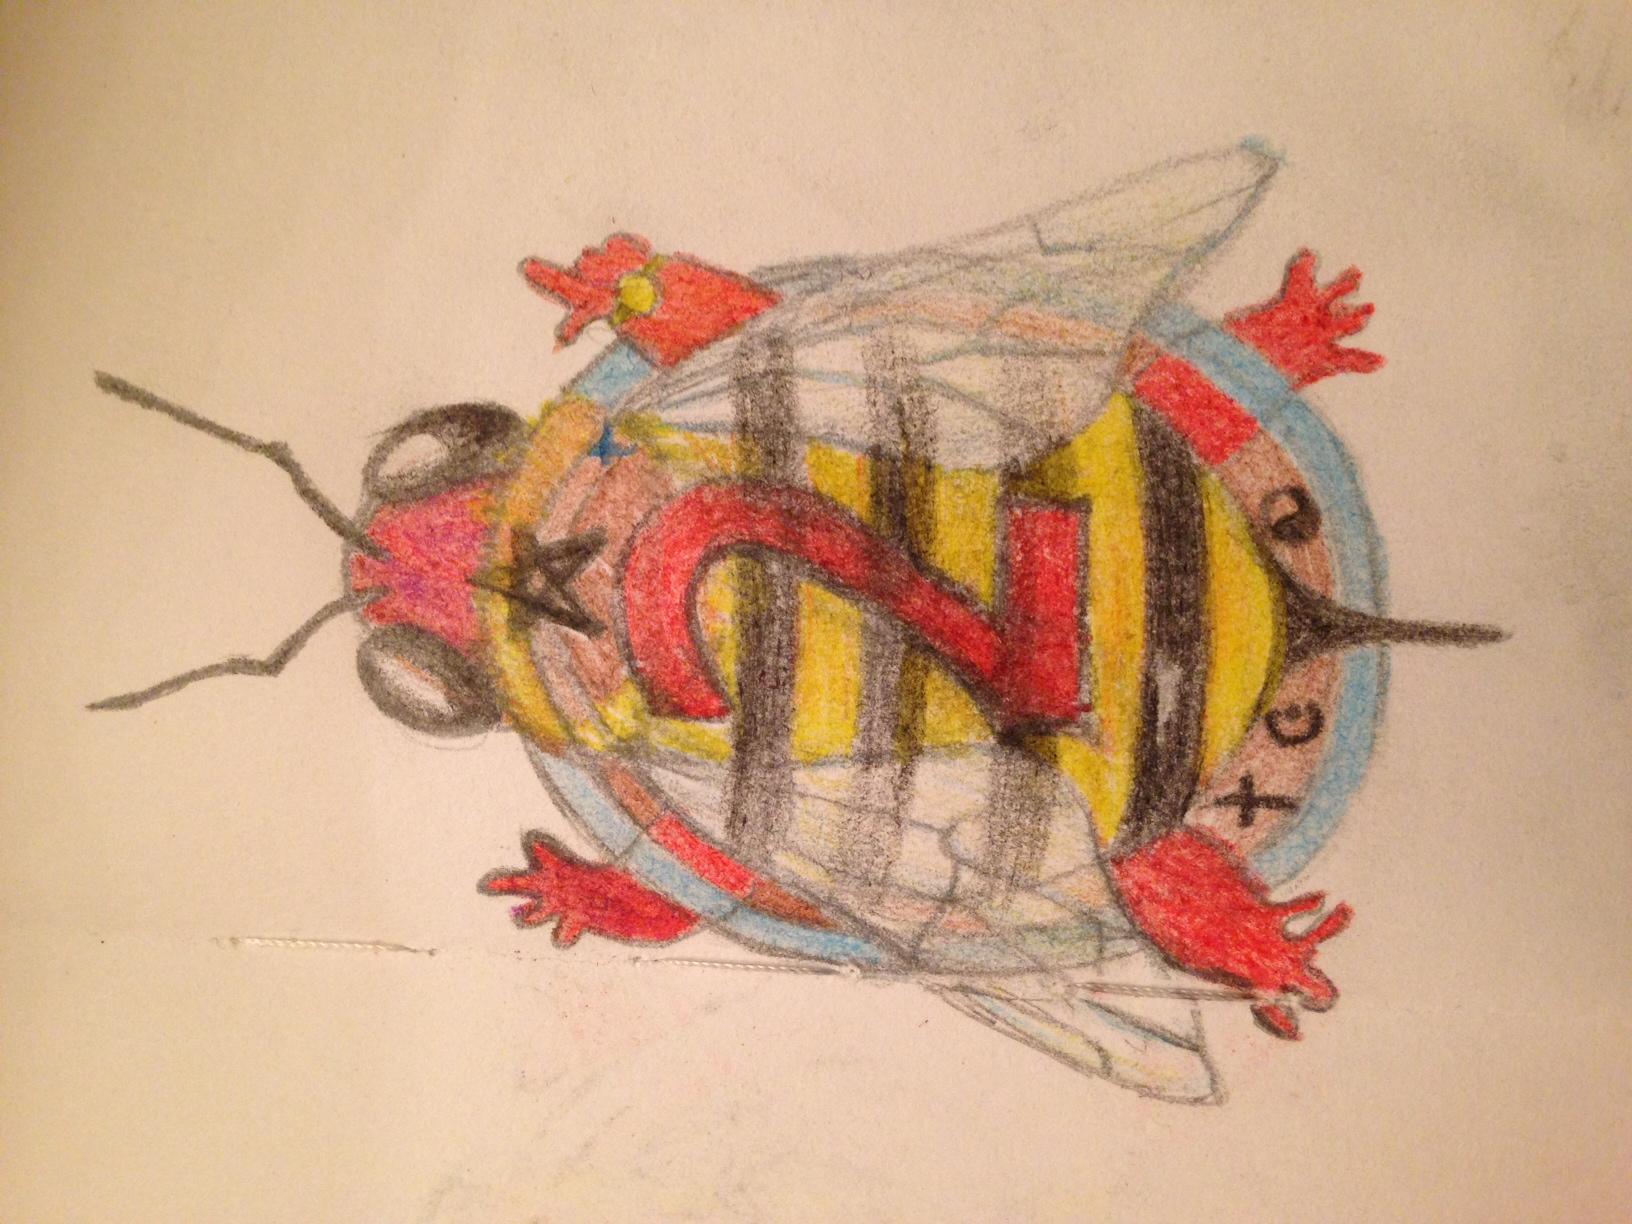 ZZ the Bee